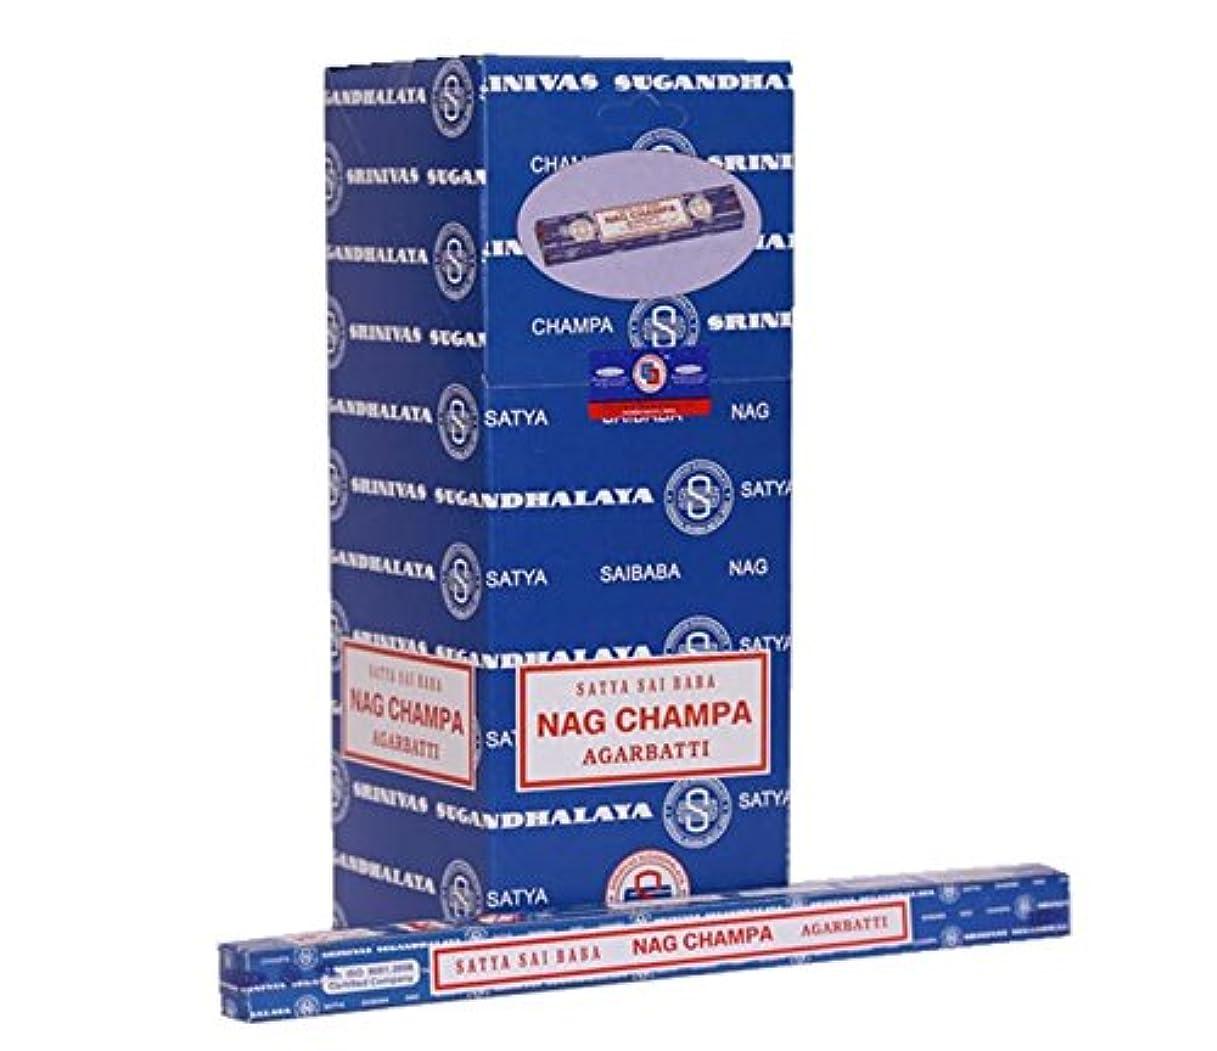 SAI BABA Nag Champa Satyaお香250グラム| 25パックの10グラム各in aボックス|エクスポート品質